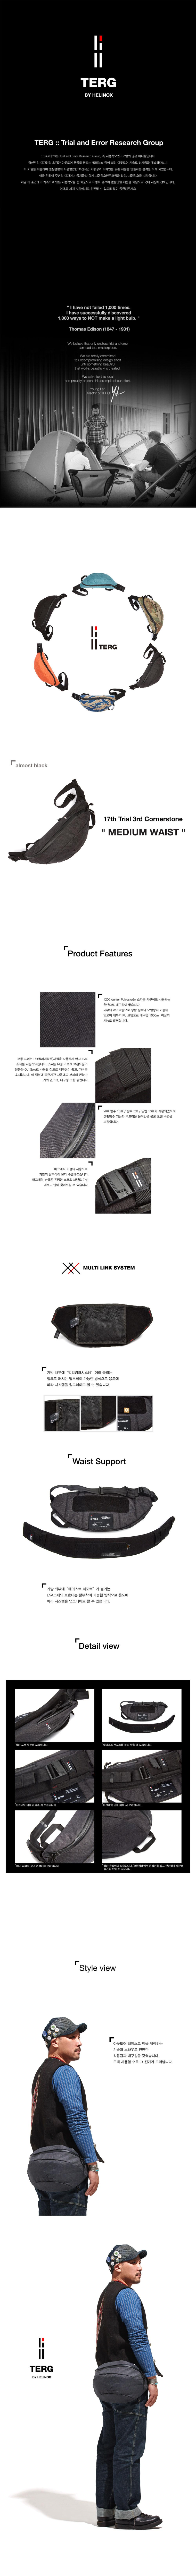 20170721-Medium-waist---almost-black.jpg